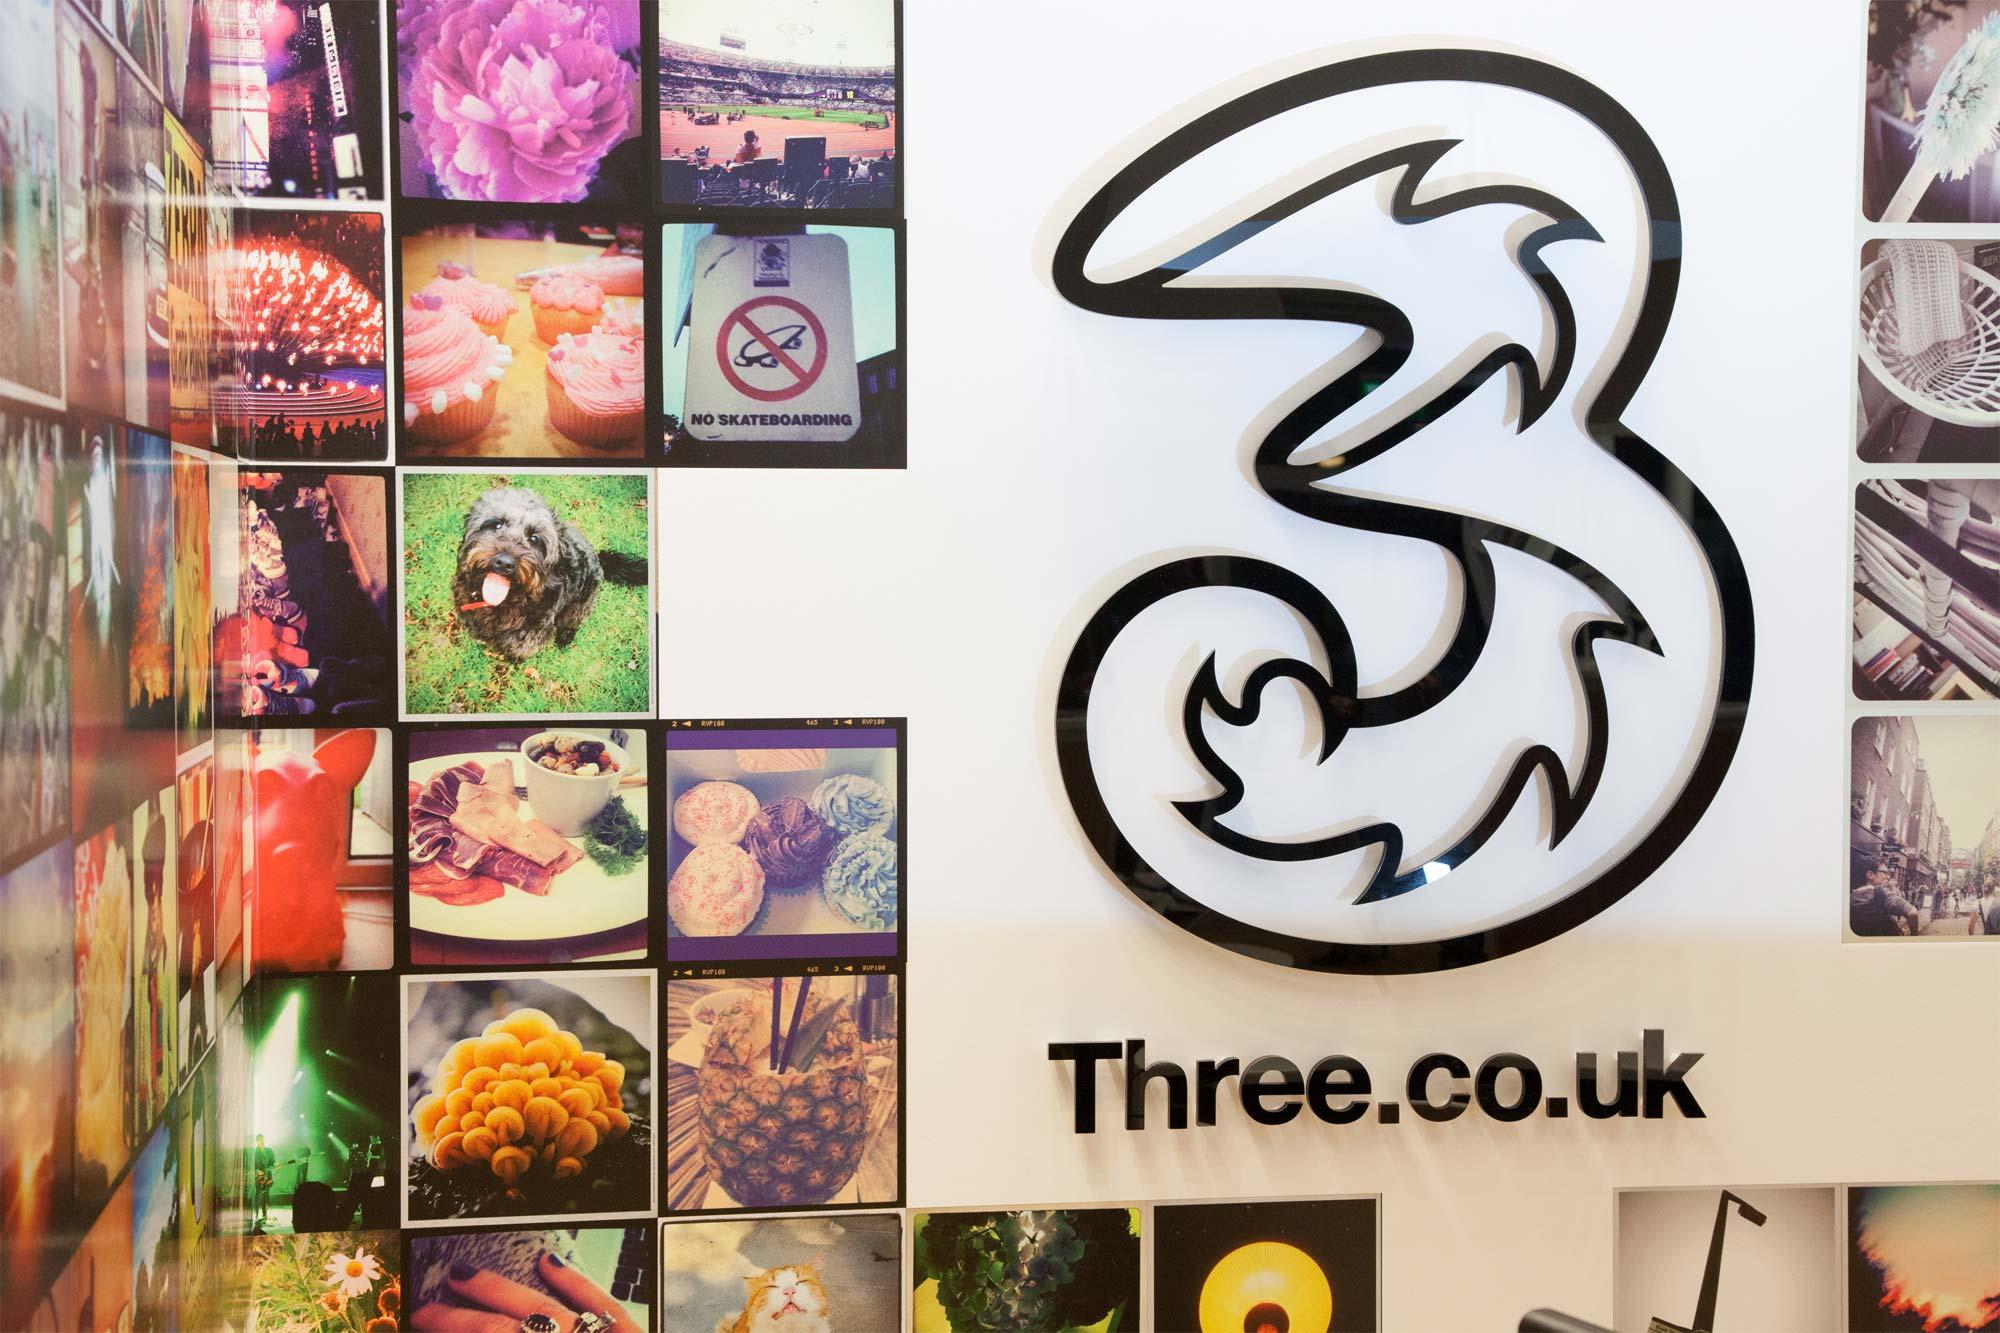 Three-mobile-store-logo.jpg